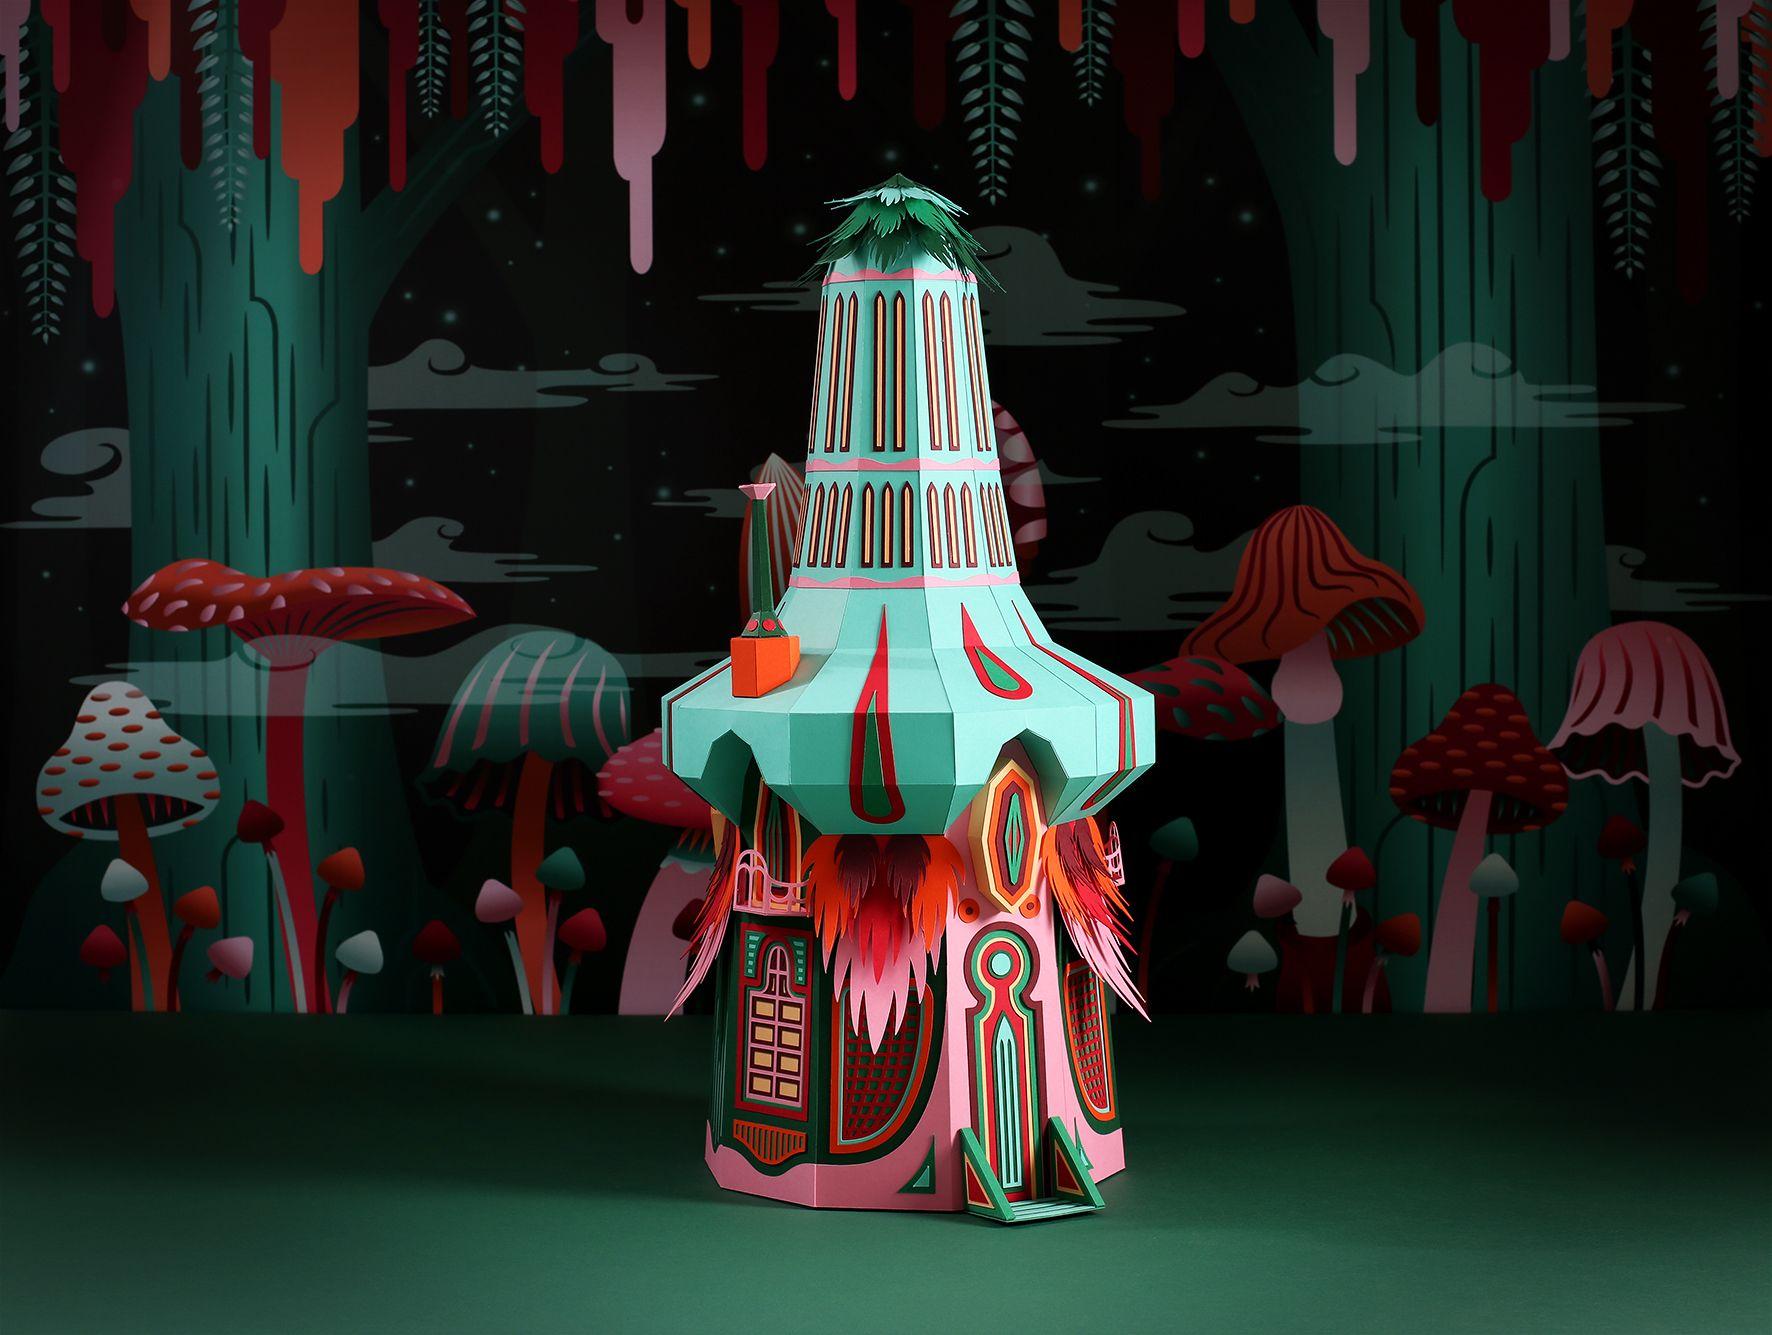 Color art dubai - Fantastic Miniature Worlds Of Nature Bursting With Color For Herm S Window Display In Dubai Mushroom